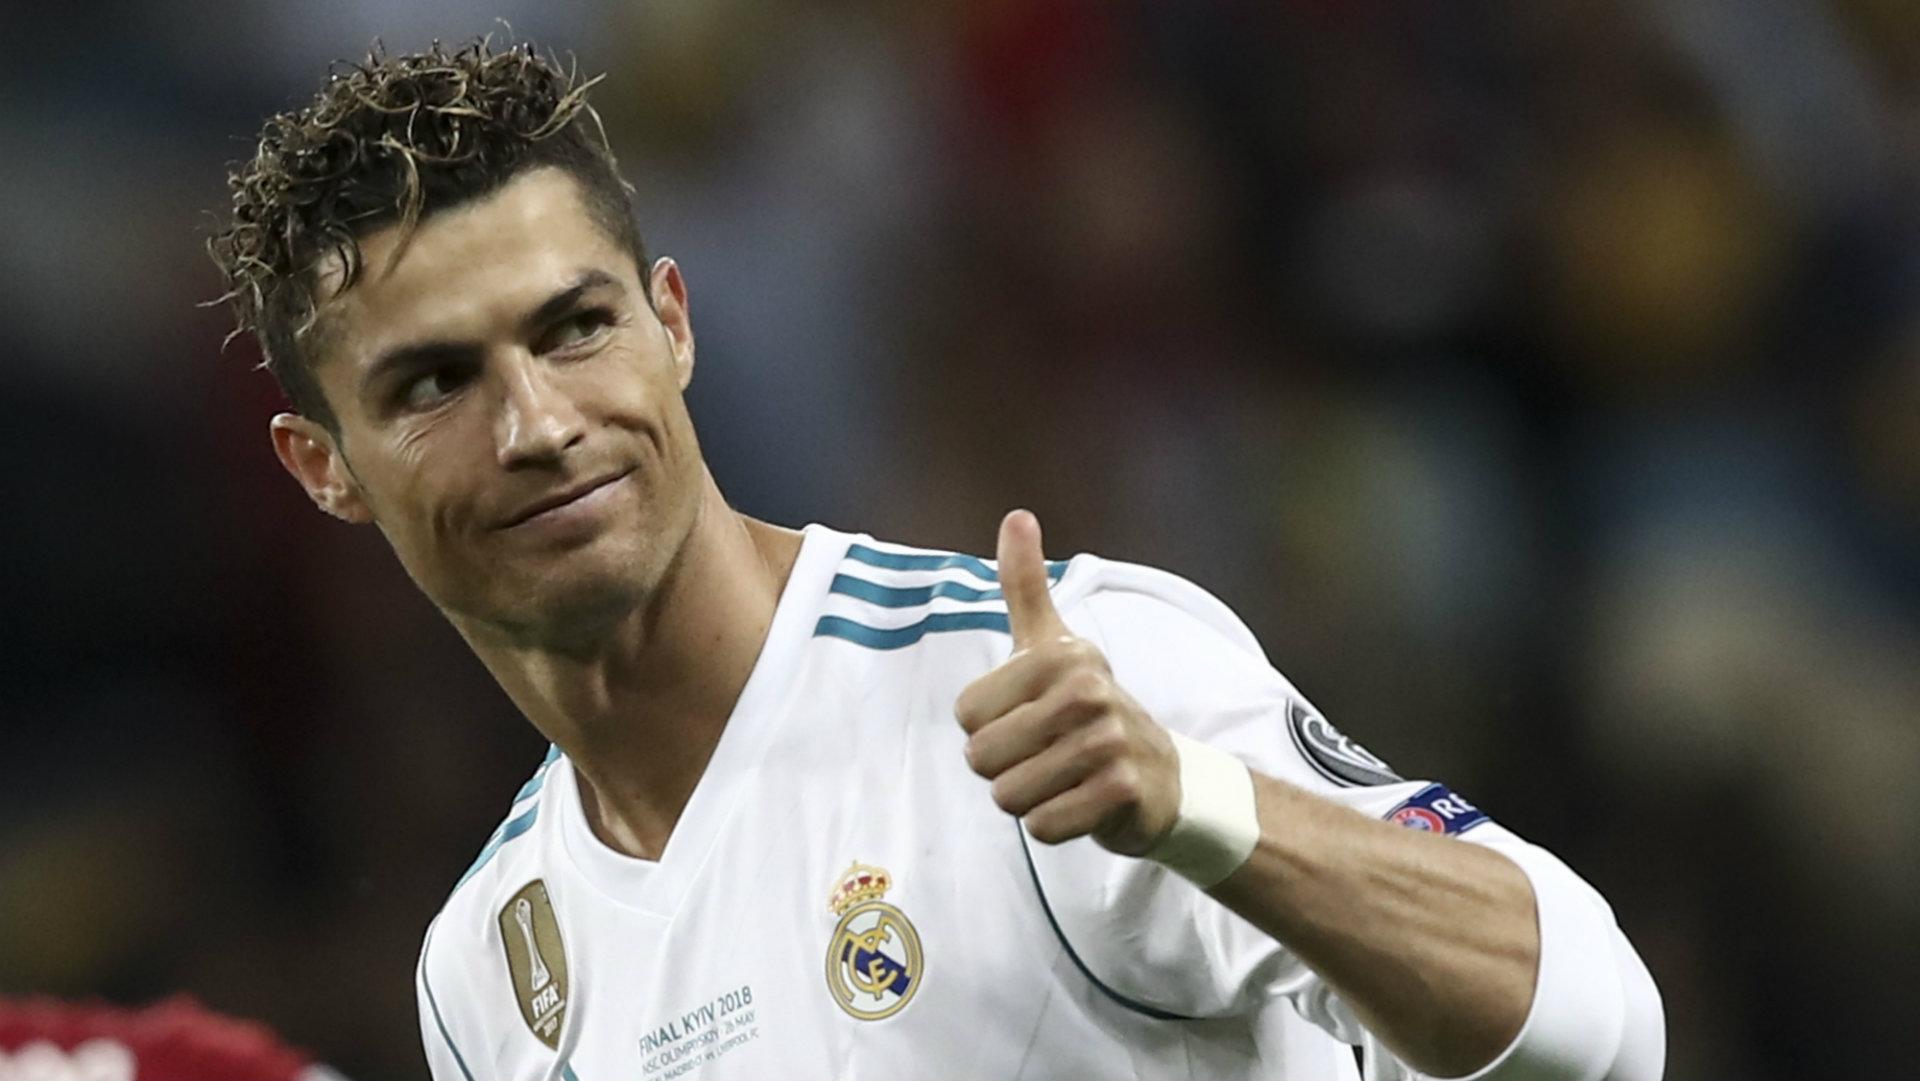 Cristiano Ronaldo faces imprisonment for non-payment of taxes 31.07.2017 64